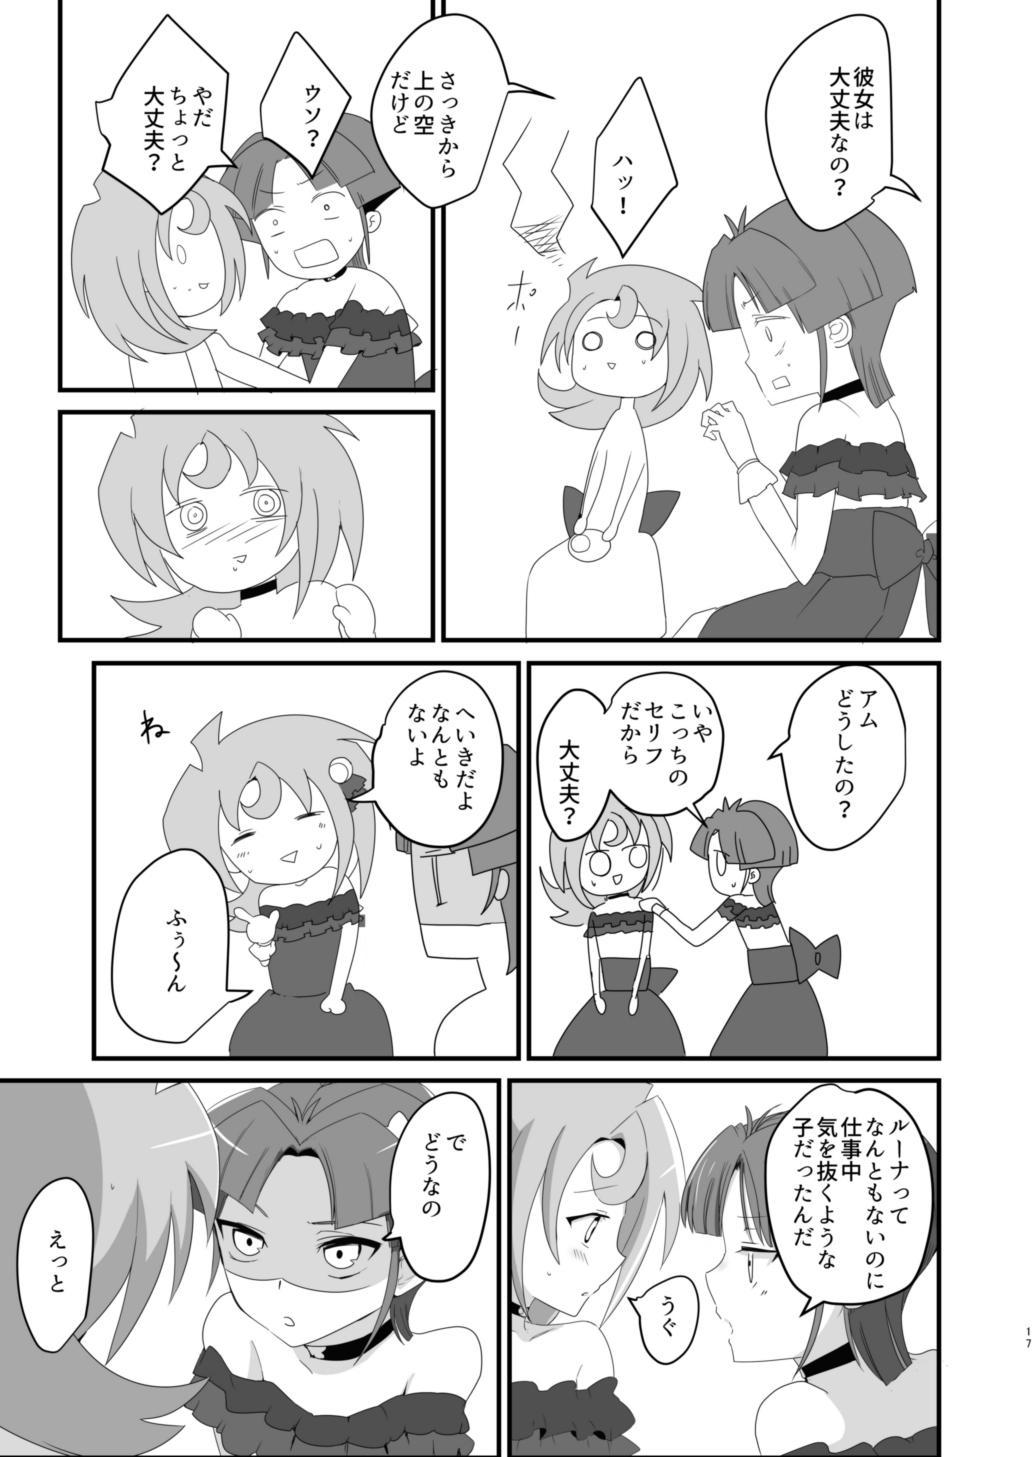 LunaAm O♂n♂n Akushuukai 15